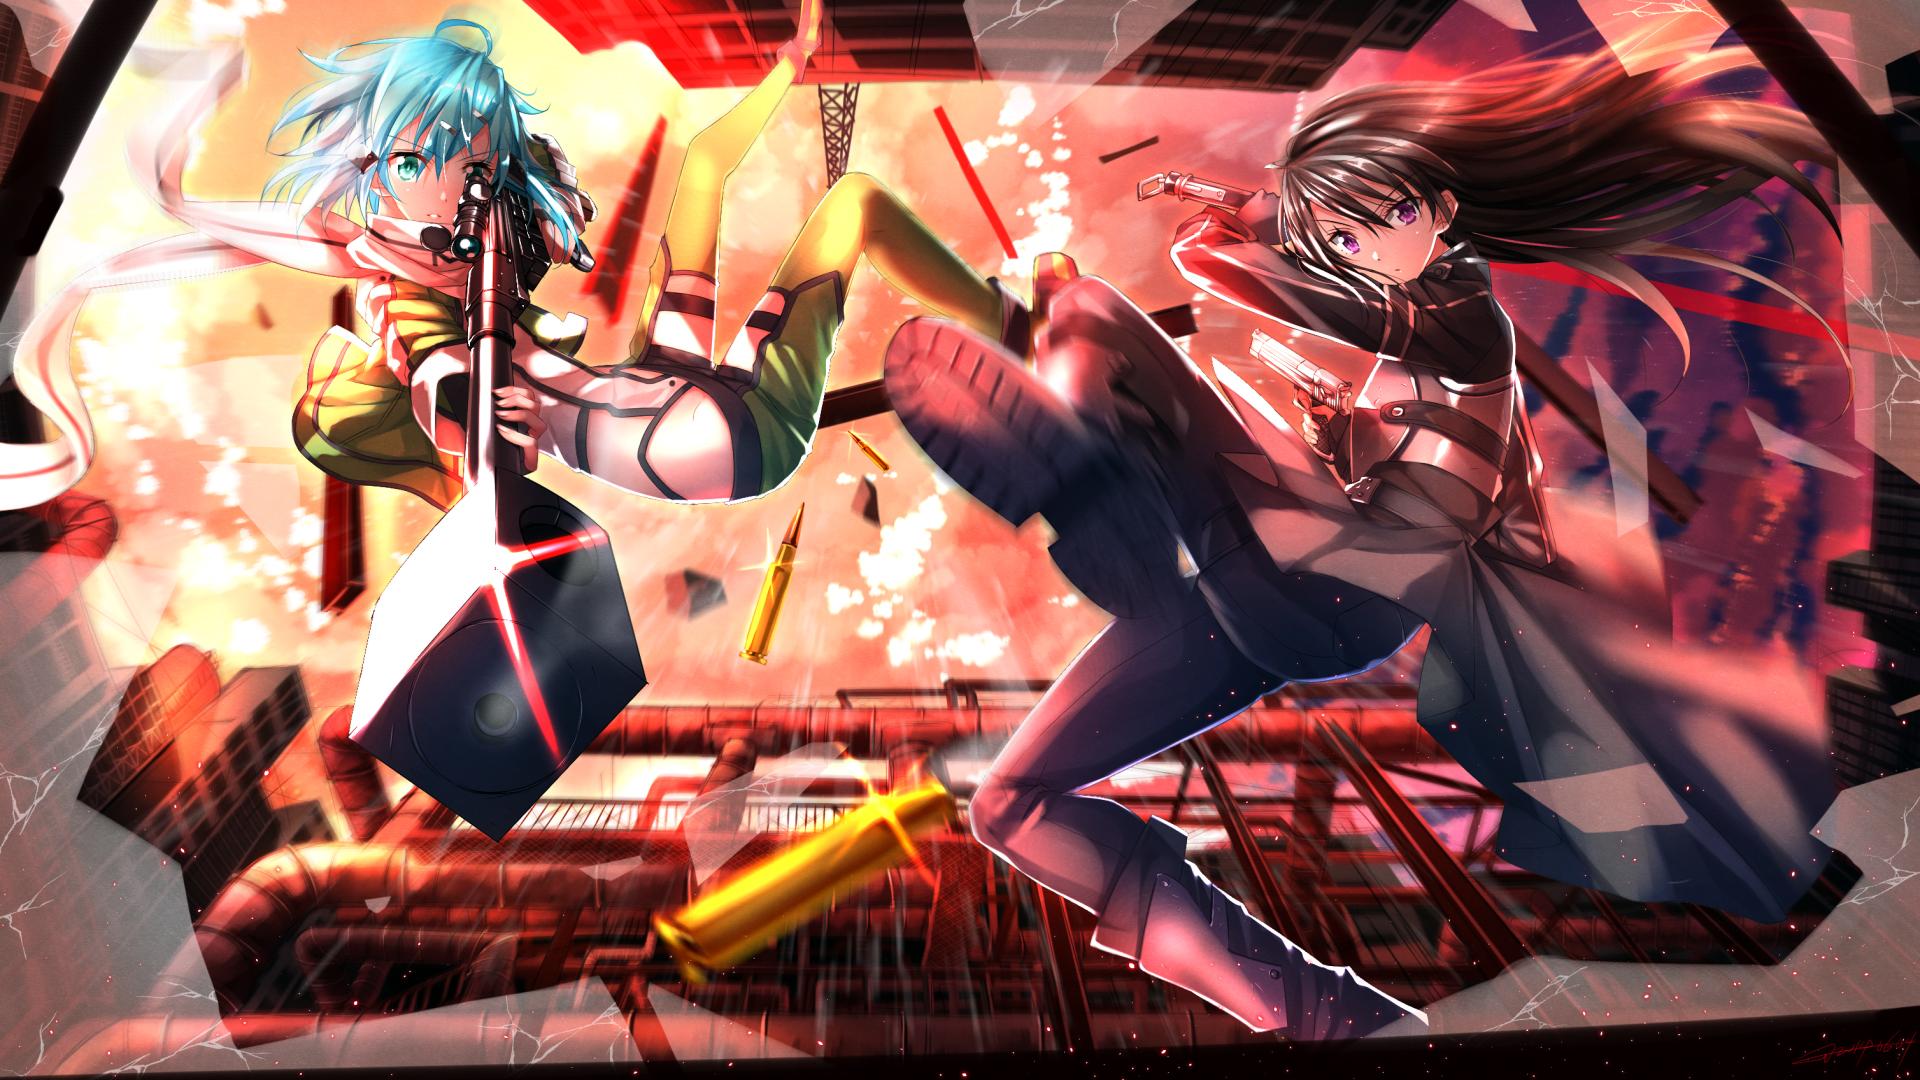 3rd Season Sword Art Online 2 Background Wallpaper Animewp Com